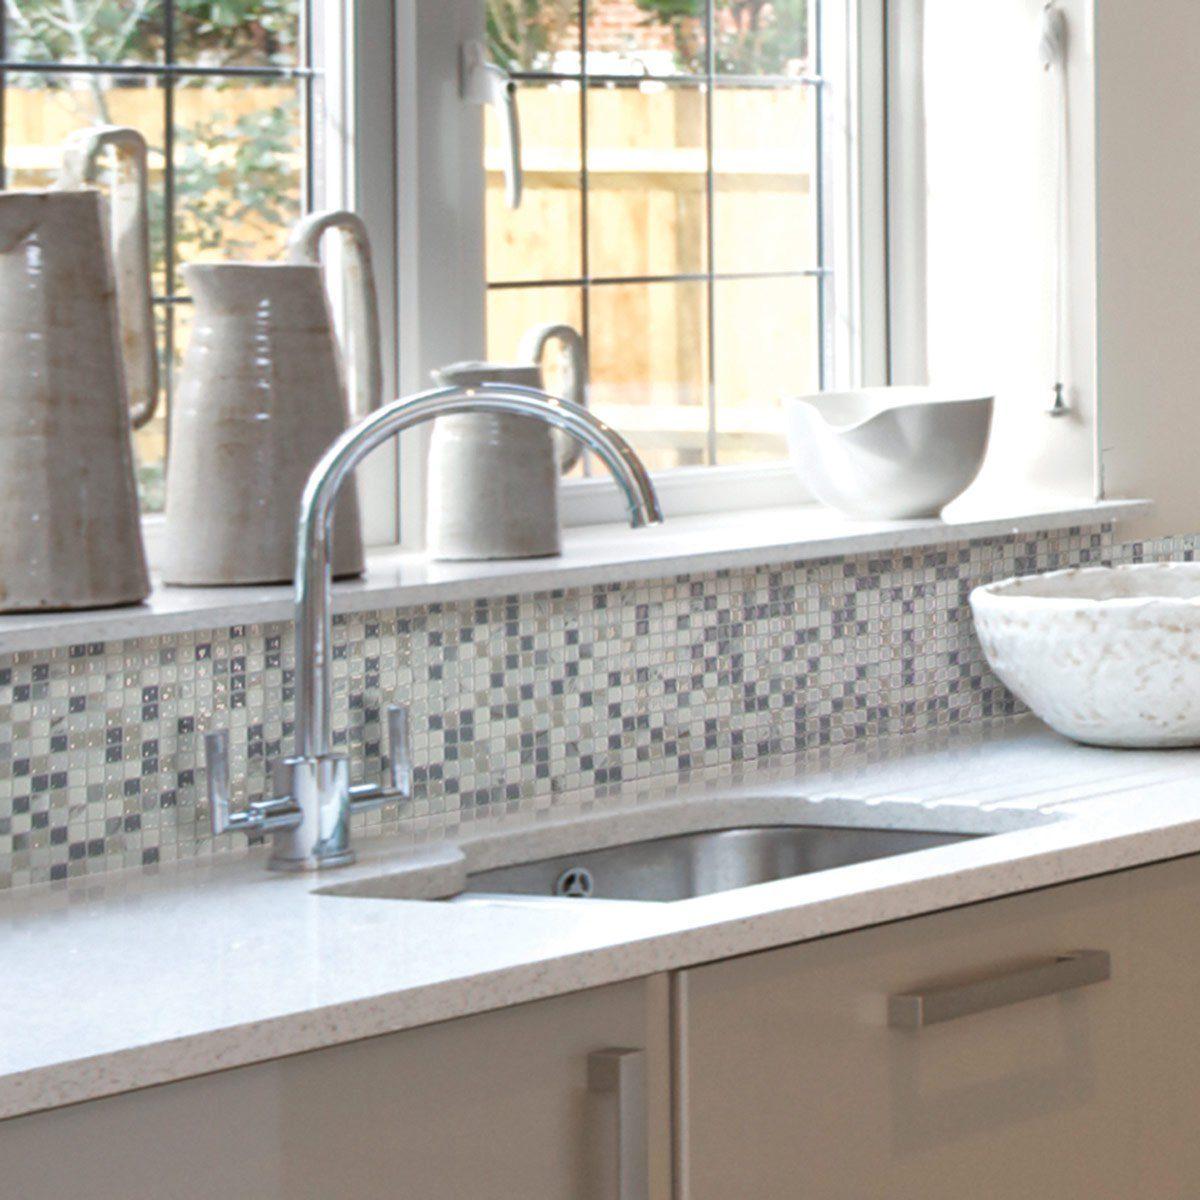 Kitchen with sticker tiles as its backsplash